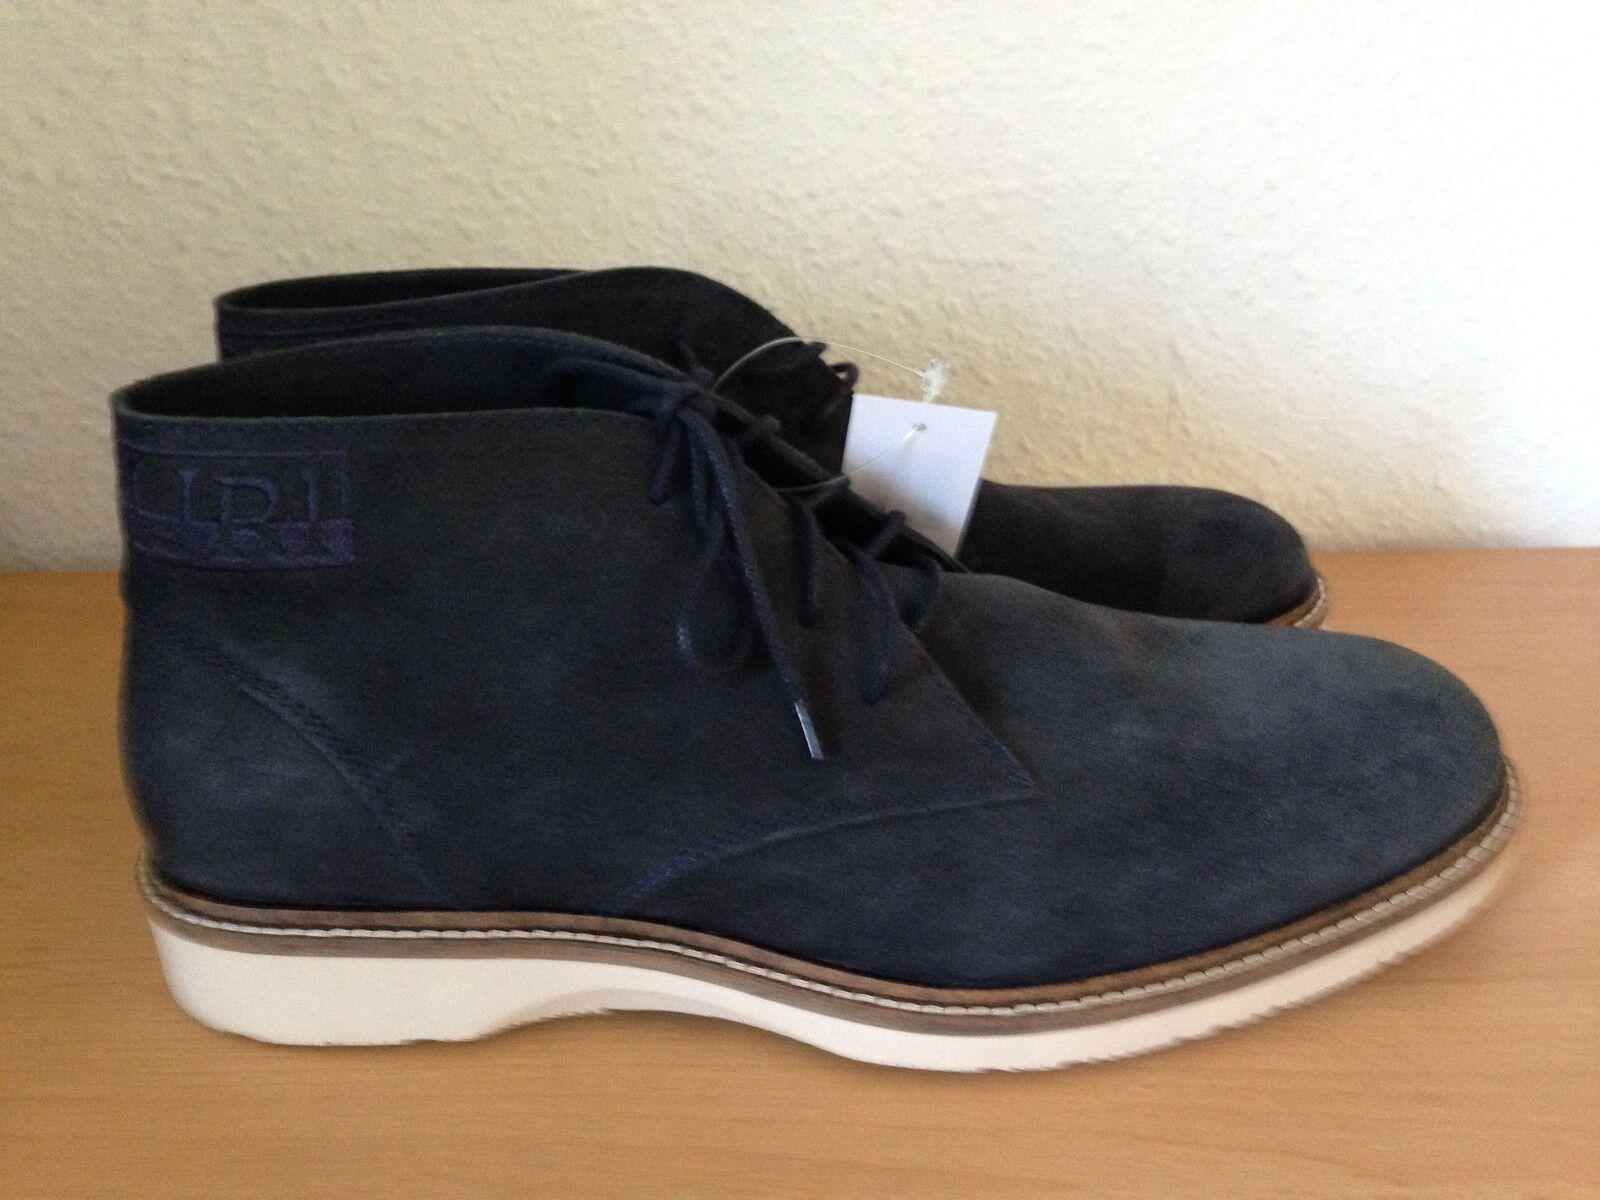 Napapijri Stiefeletten Boots Wildleder Gr 45 dunkelblau Neu Herrenschuhe Stiefel